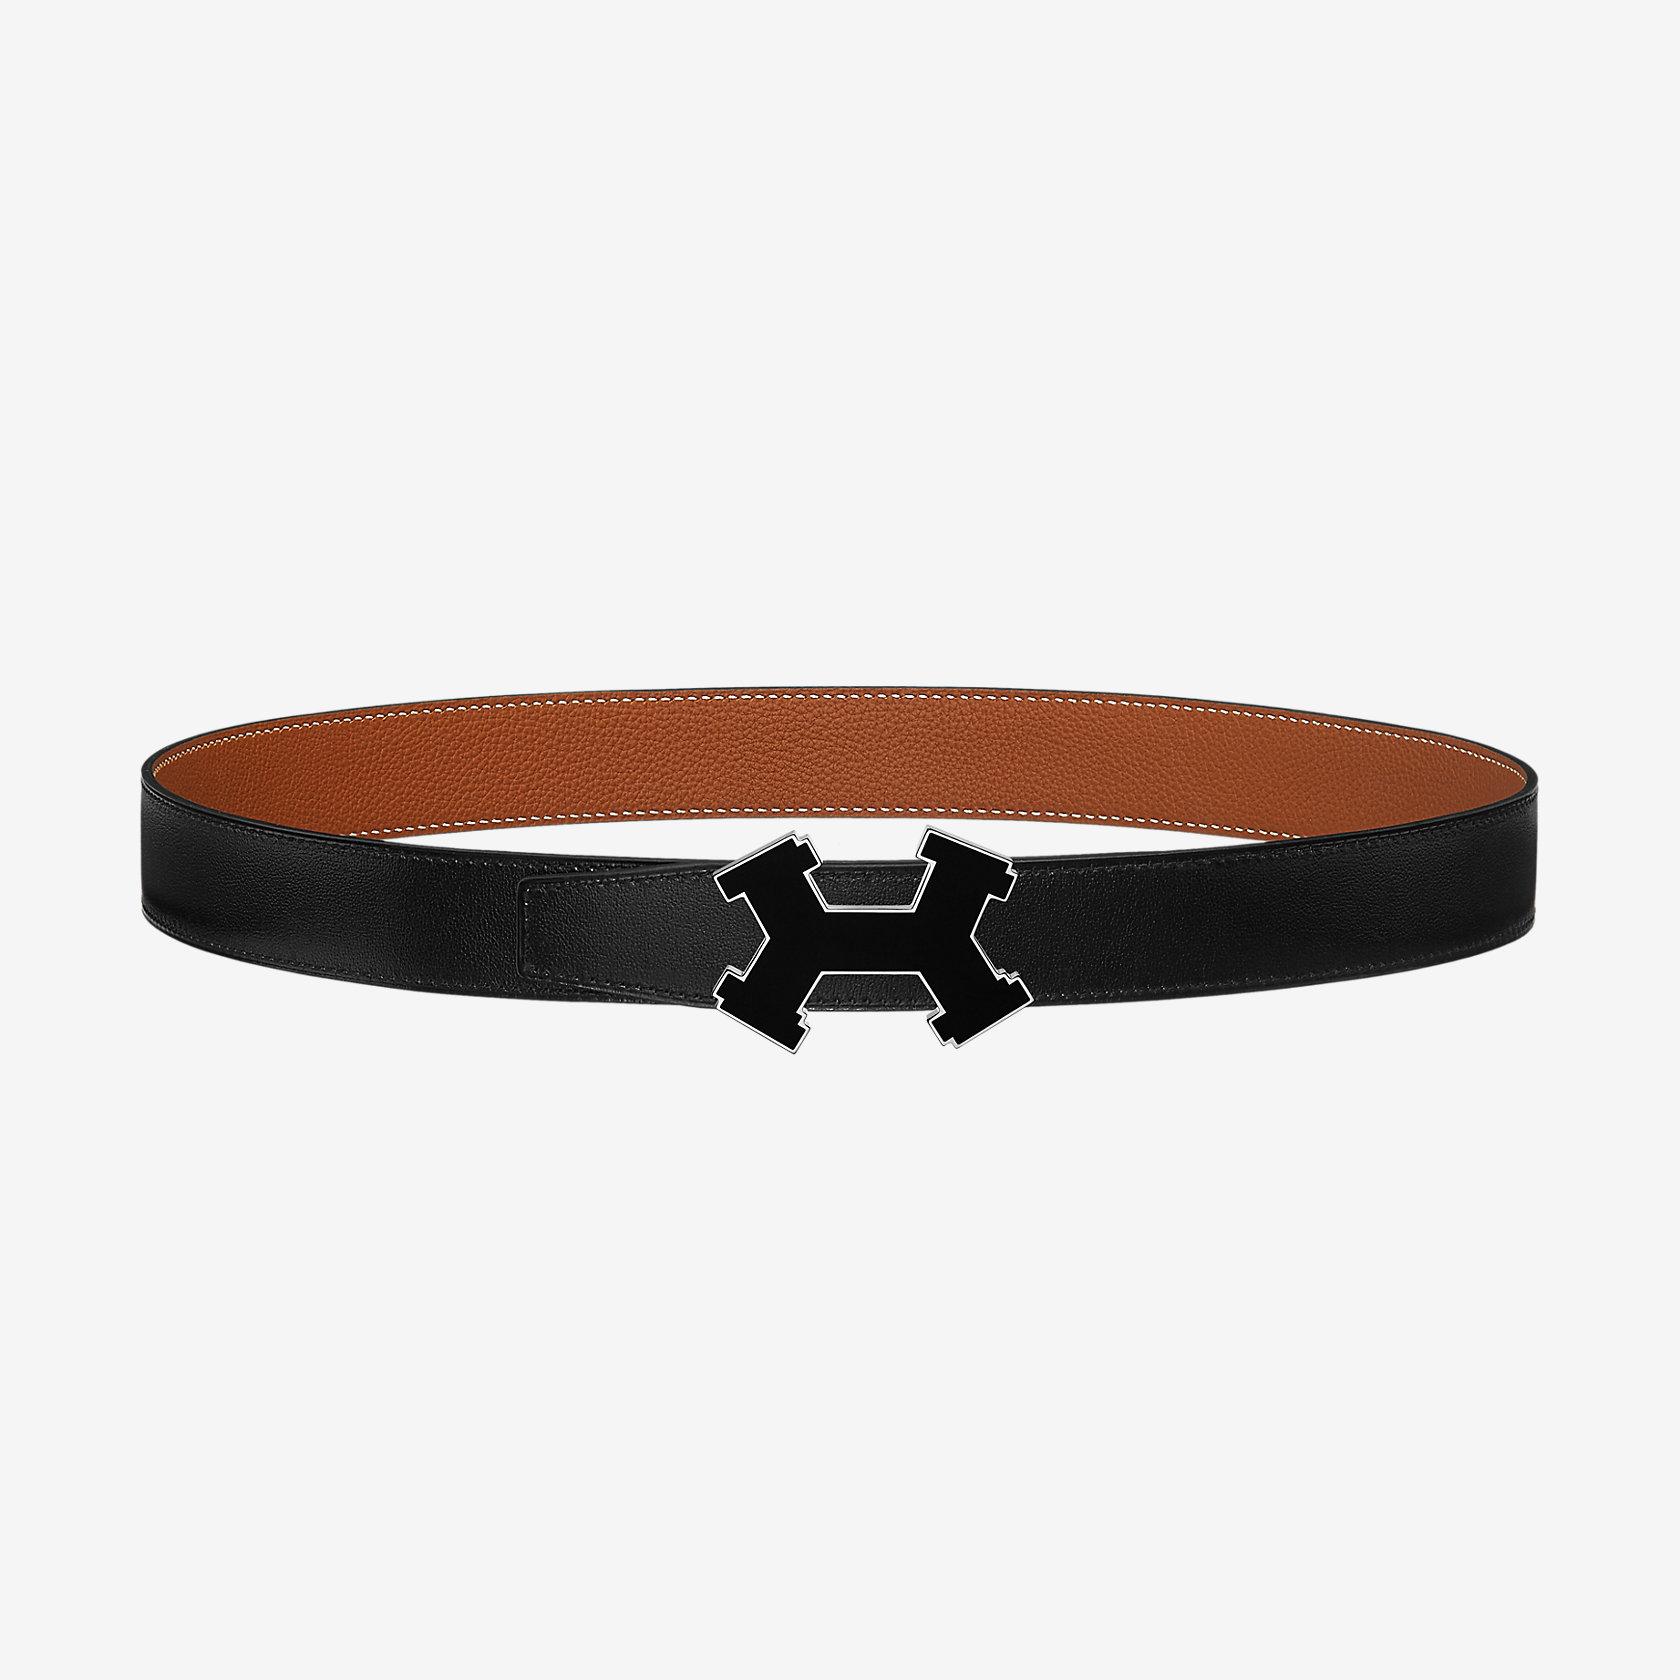 Fashion week How to hermes wear belt buckle for girls